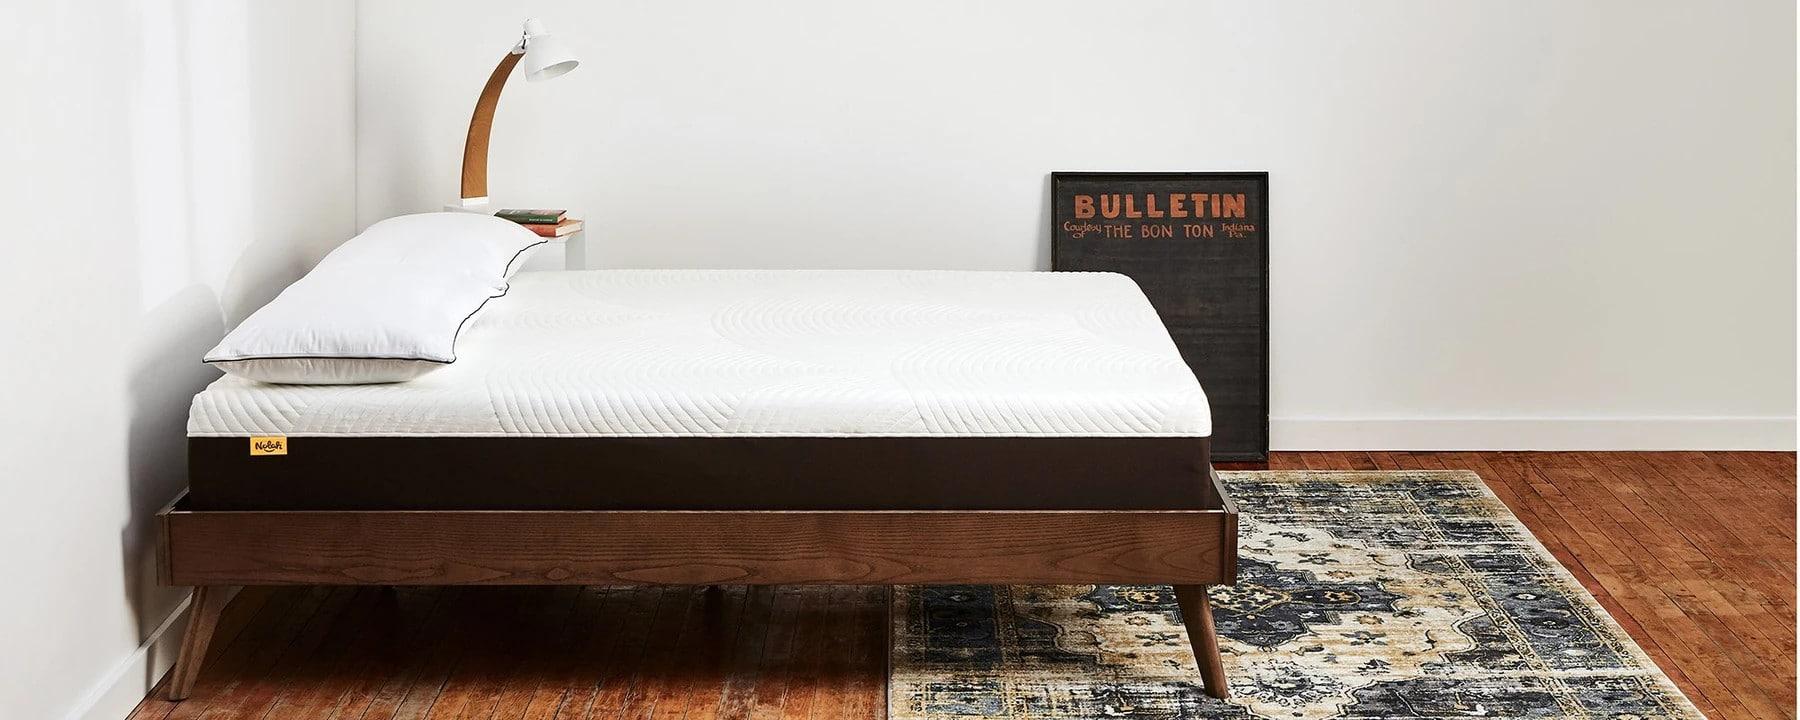 mattress brand comparison review